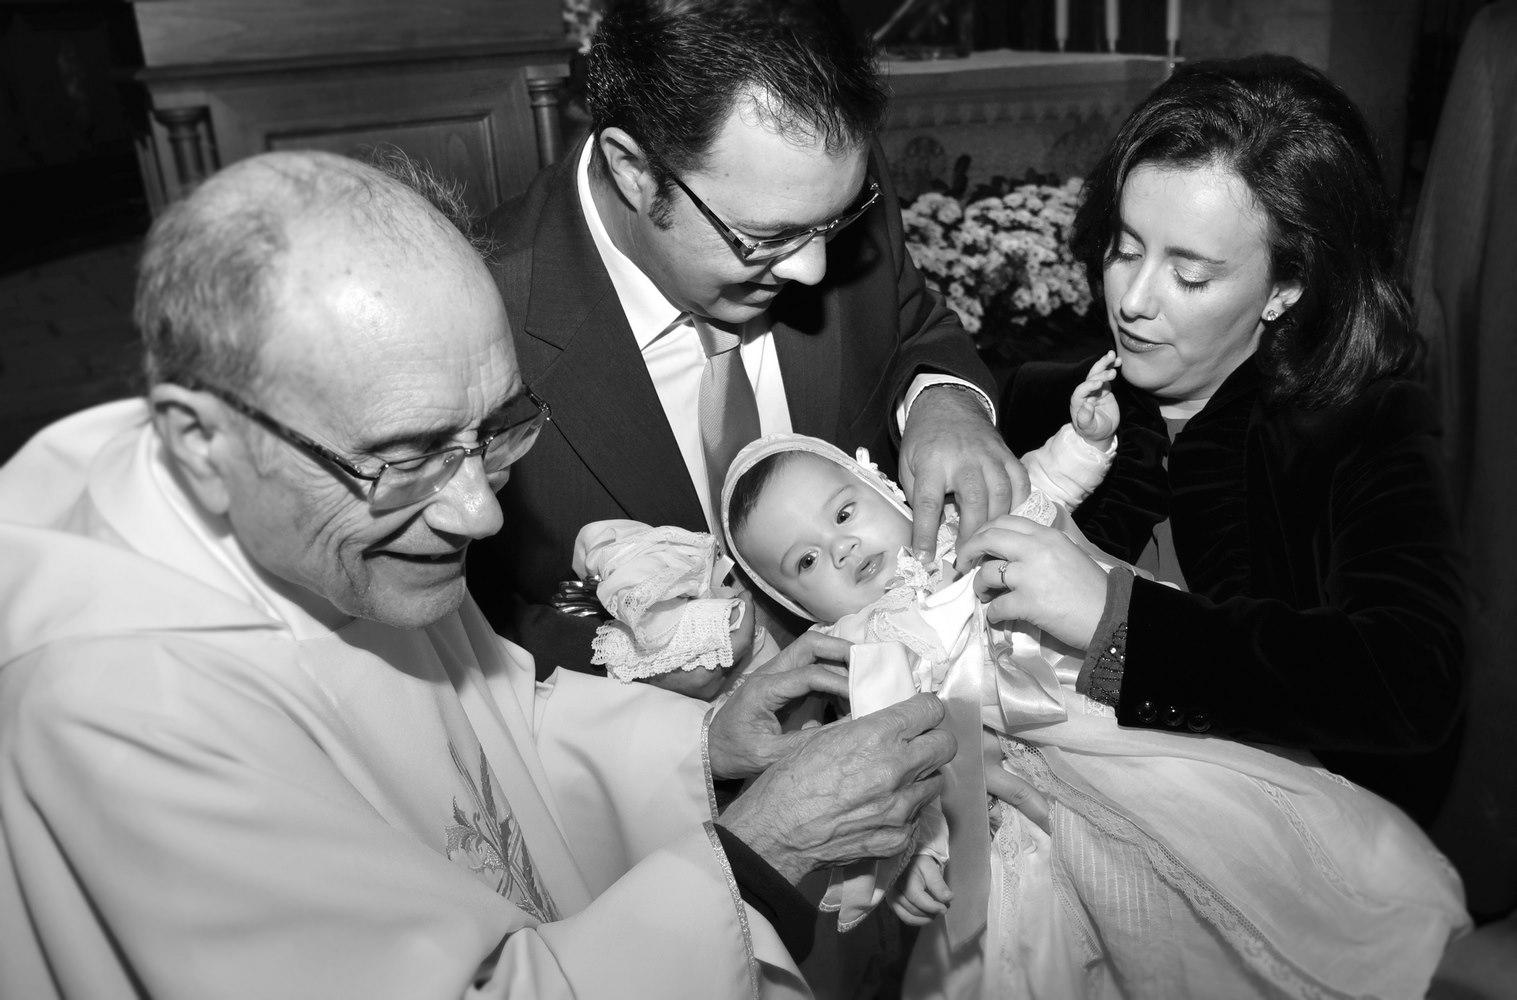 Bautizo niña bautizos